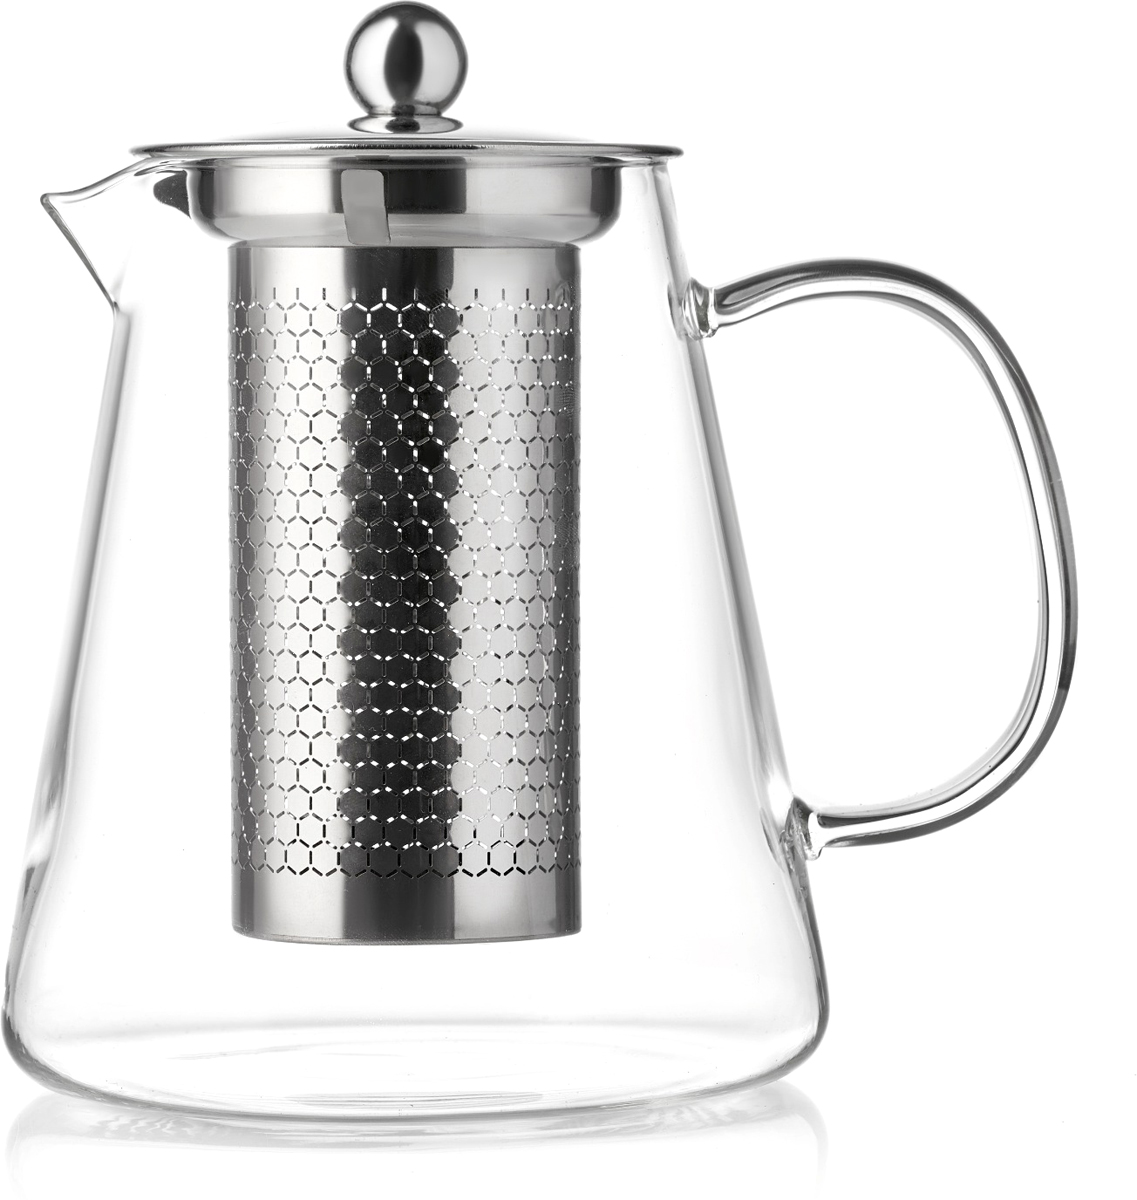 Чайник заварочный Walmer Sapphire, цвет: прозрачный, 1 л чайник заварочный bohmann 1 1 л 7350 20mrb